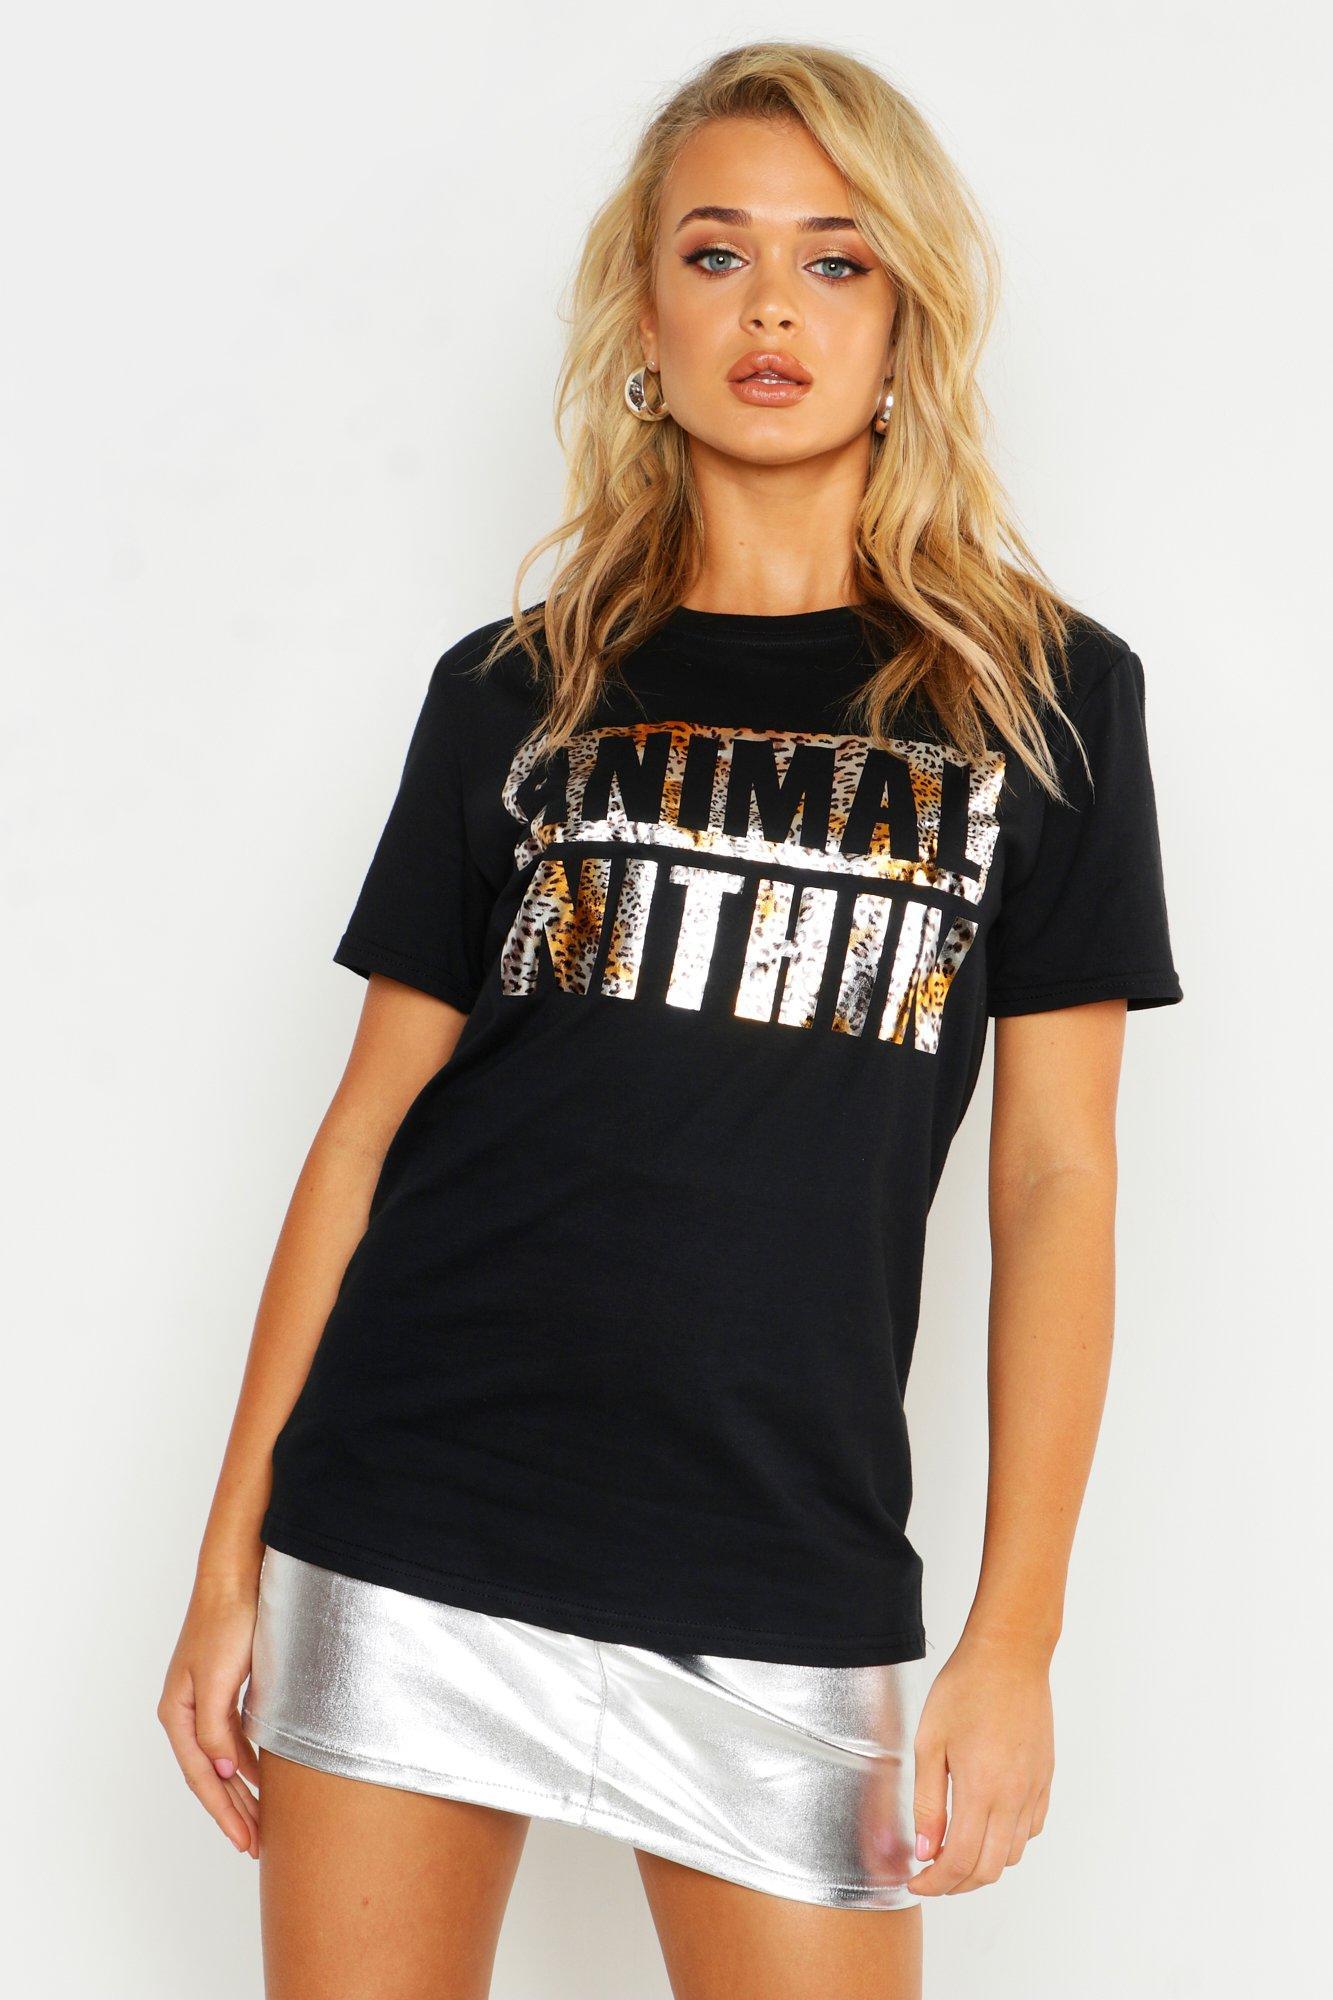 Womens Unisex T-Shirt mit Animal-Print in Bronze-Folienprint - schwarz - S, Schwarz - Boohoo.com